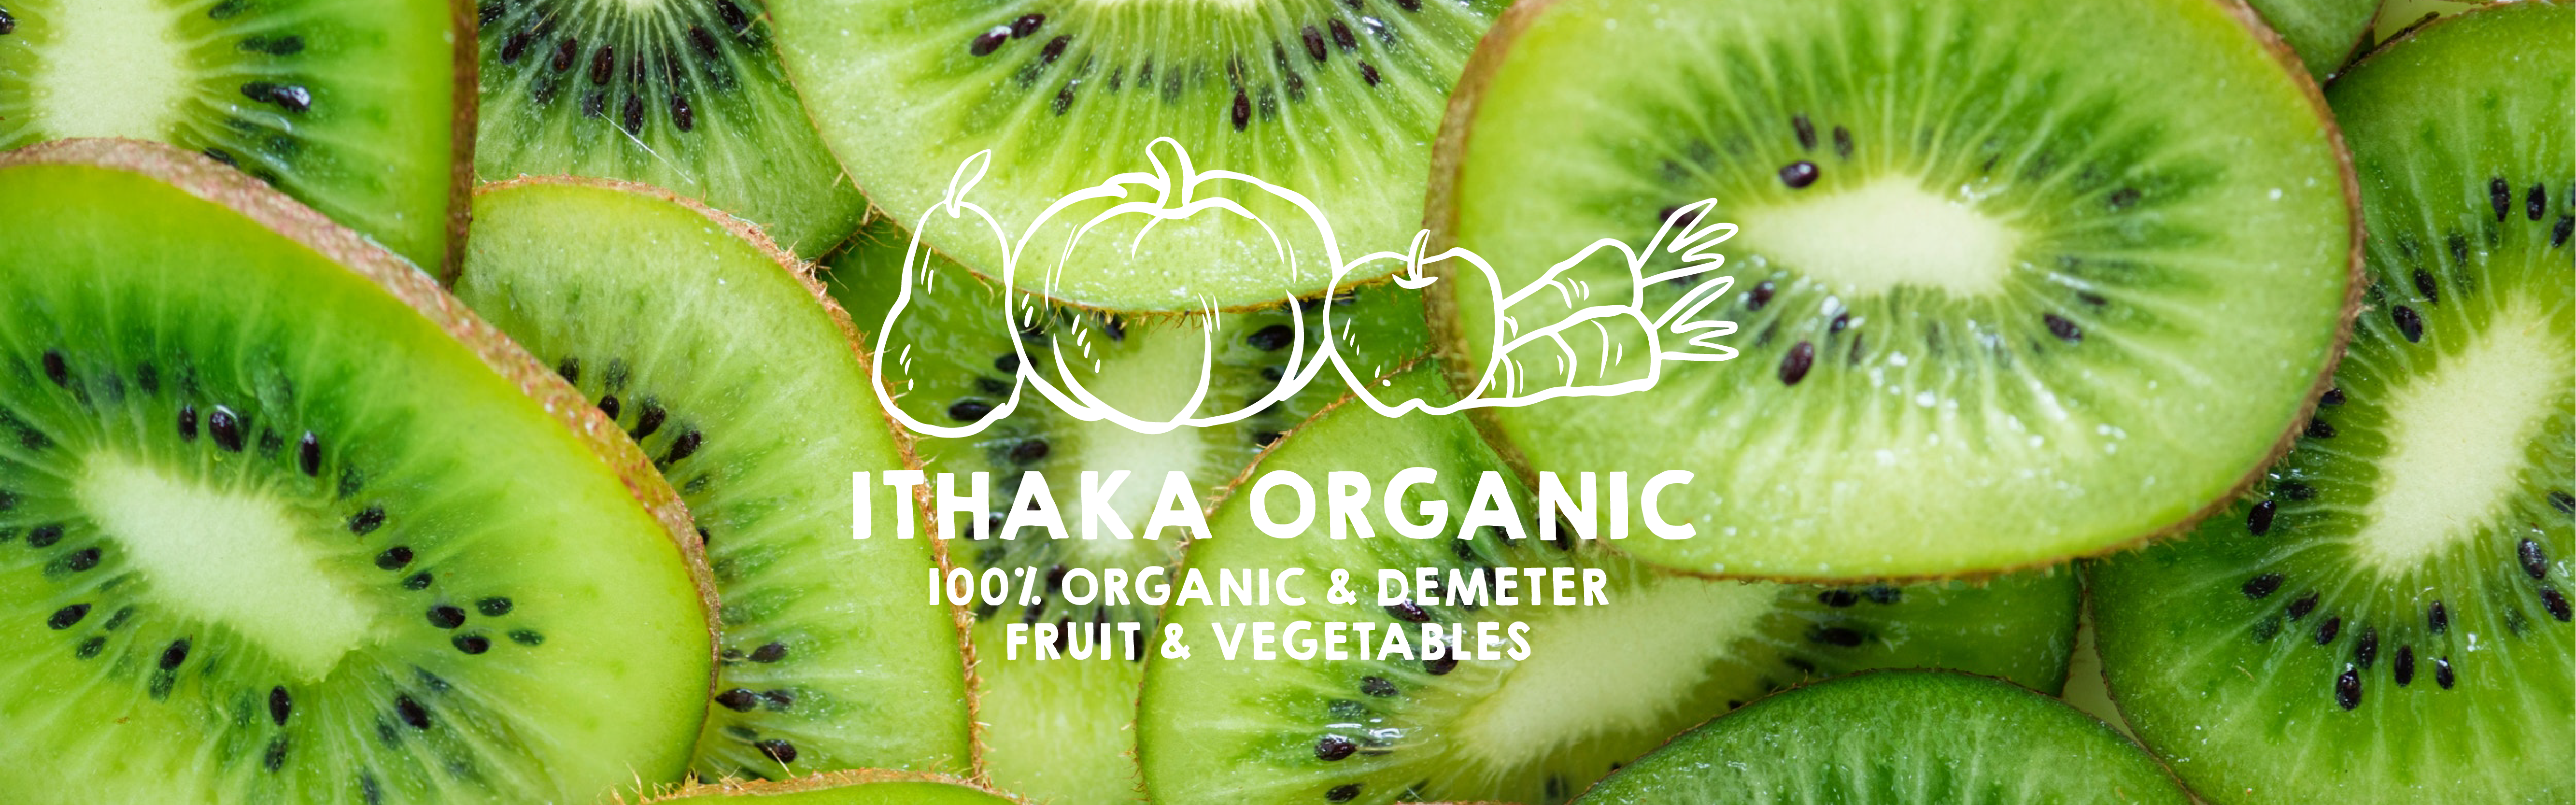 Ithaka Organic kiwi